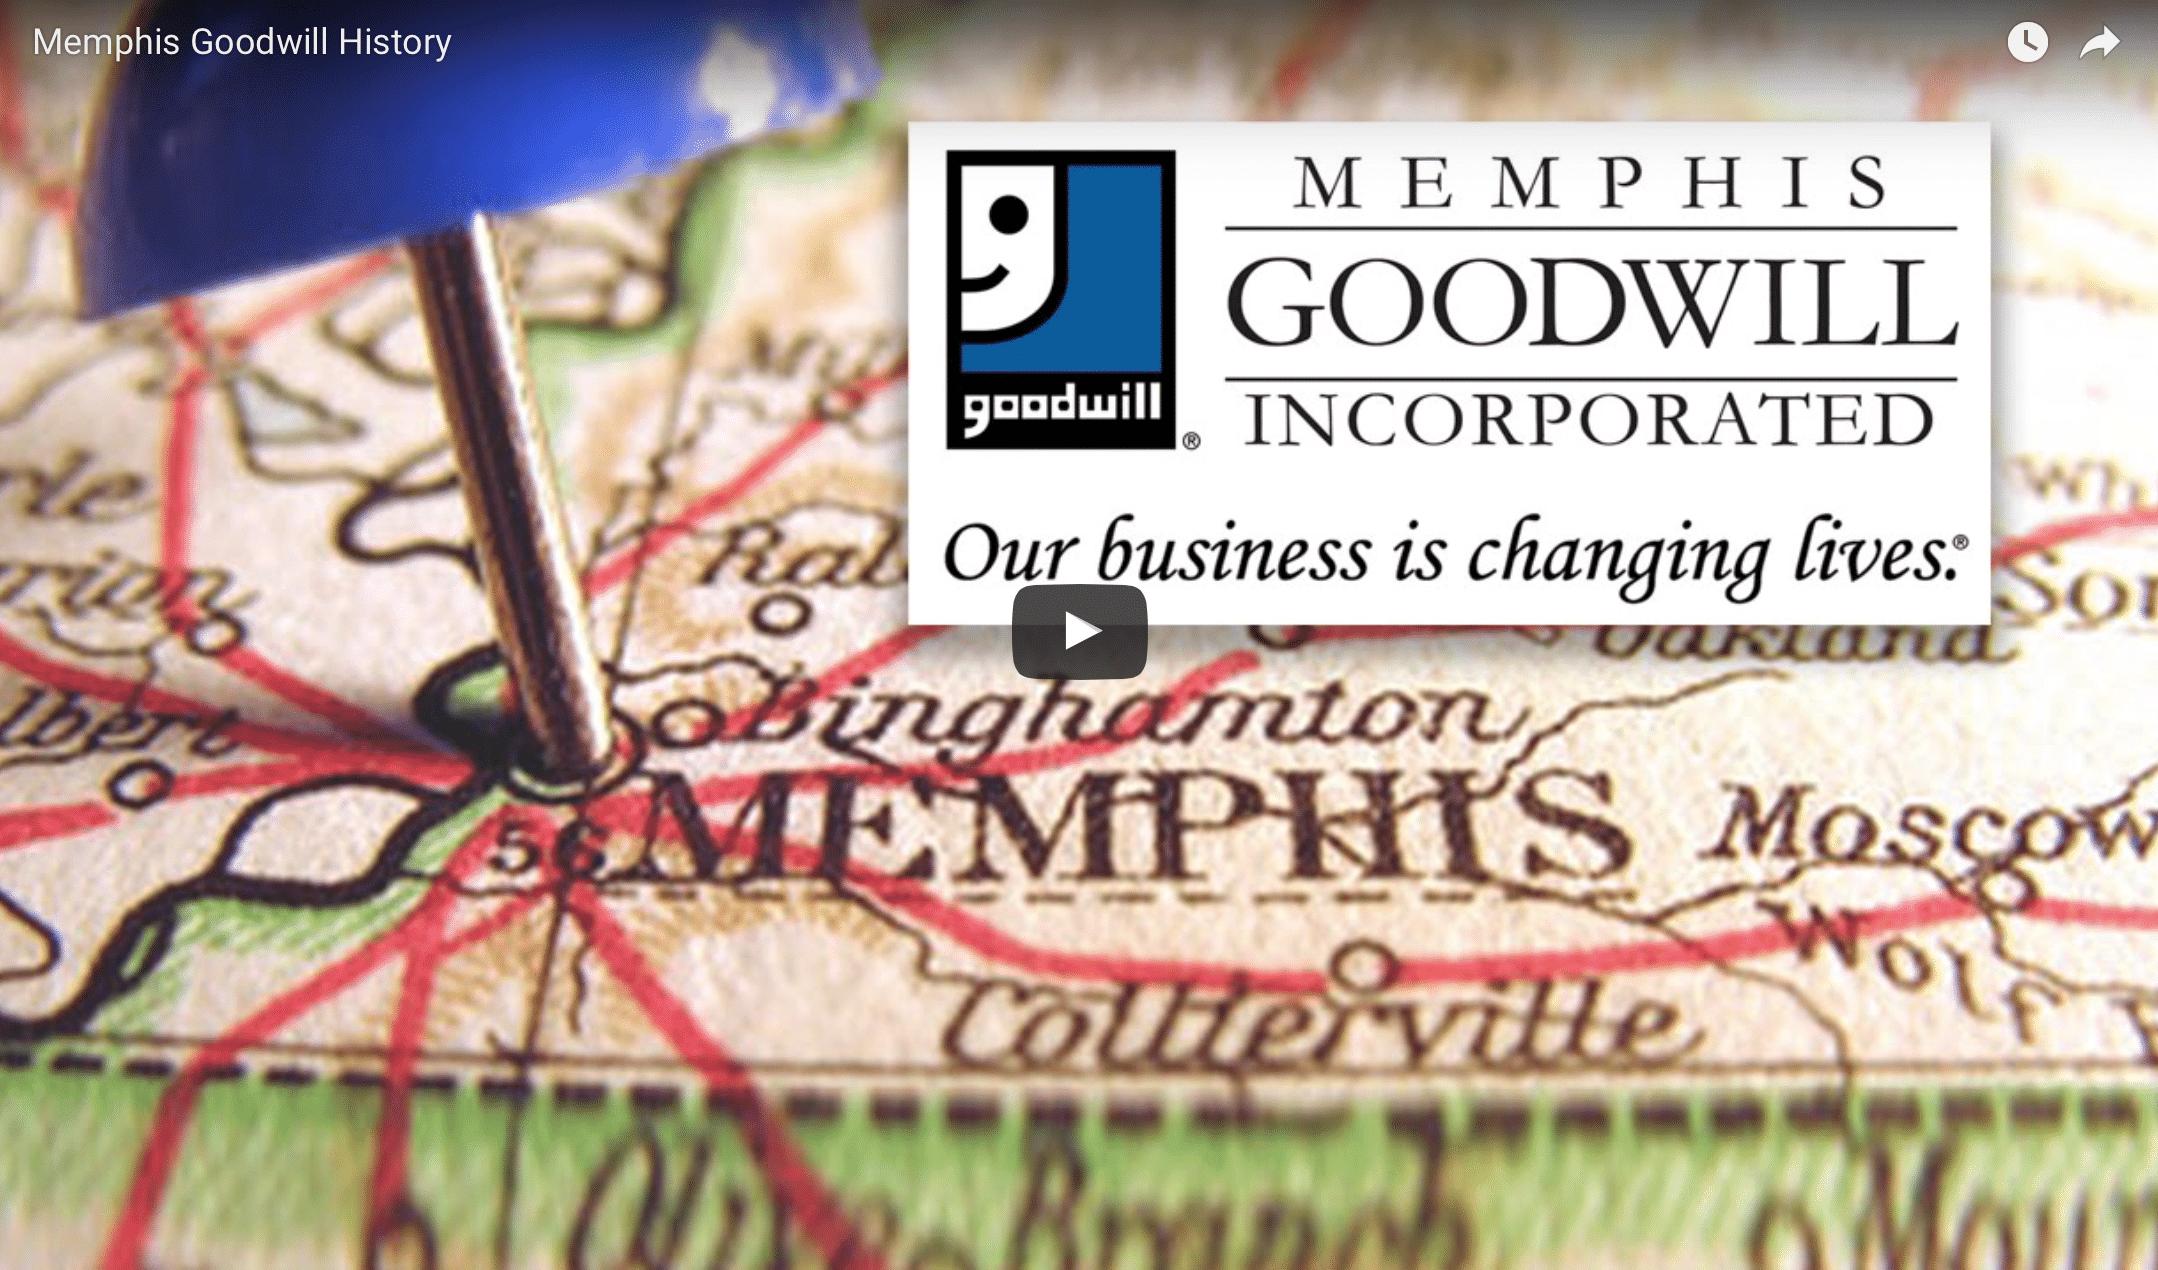 Memphis Goodwill History